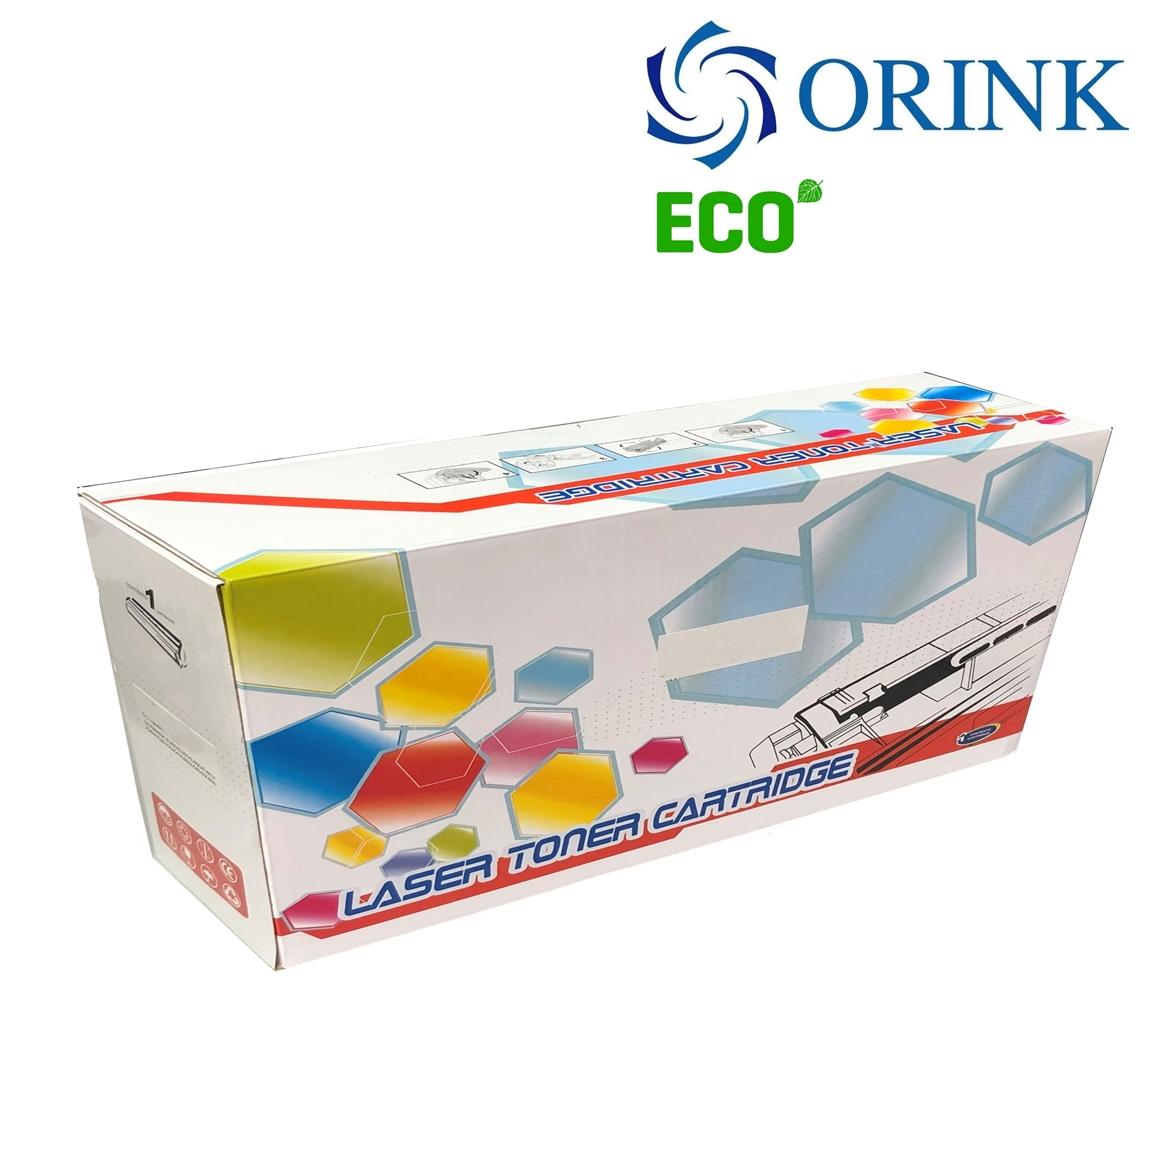 HP Q2612A/CRG703/FX10/FX9/104 (2K) ORINK ECO